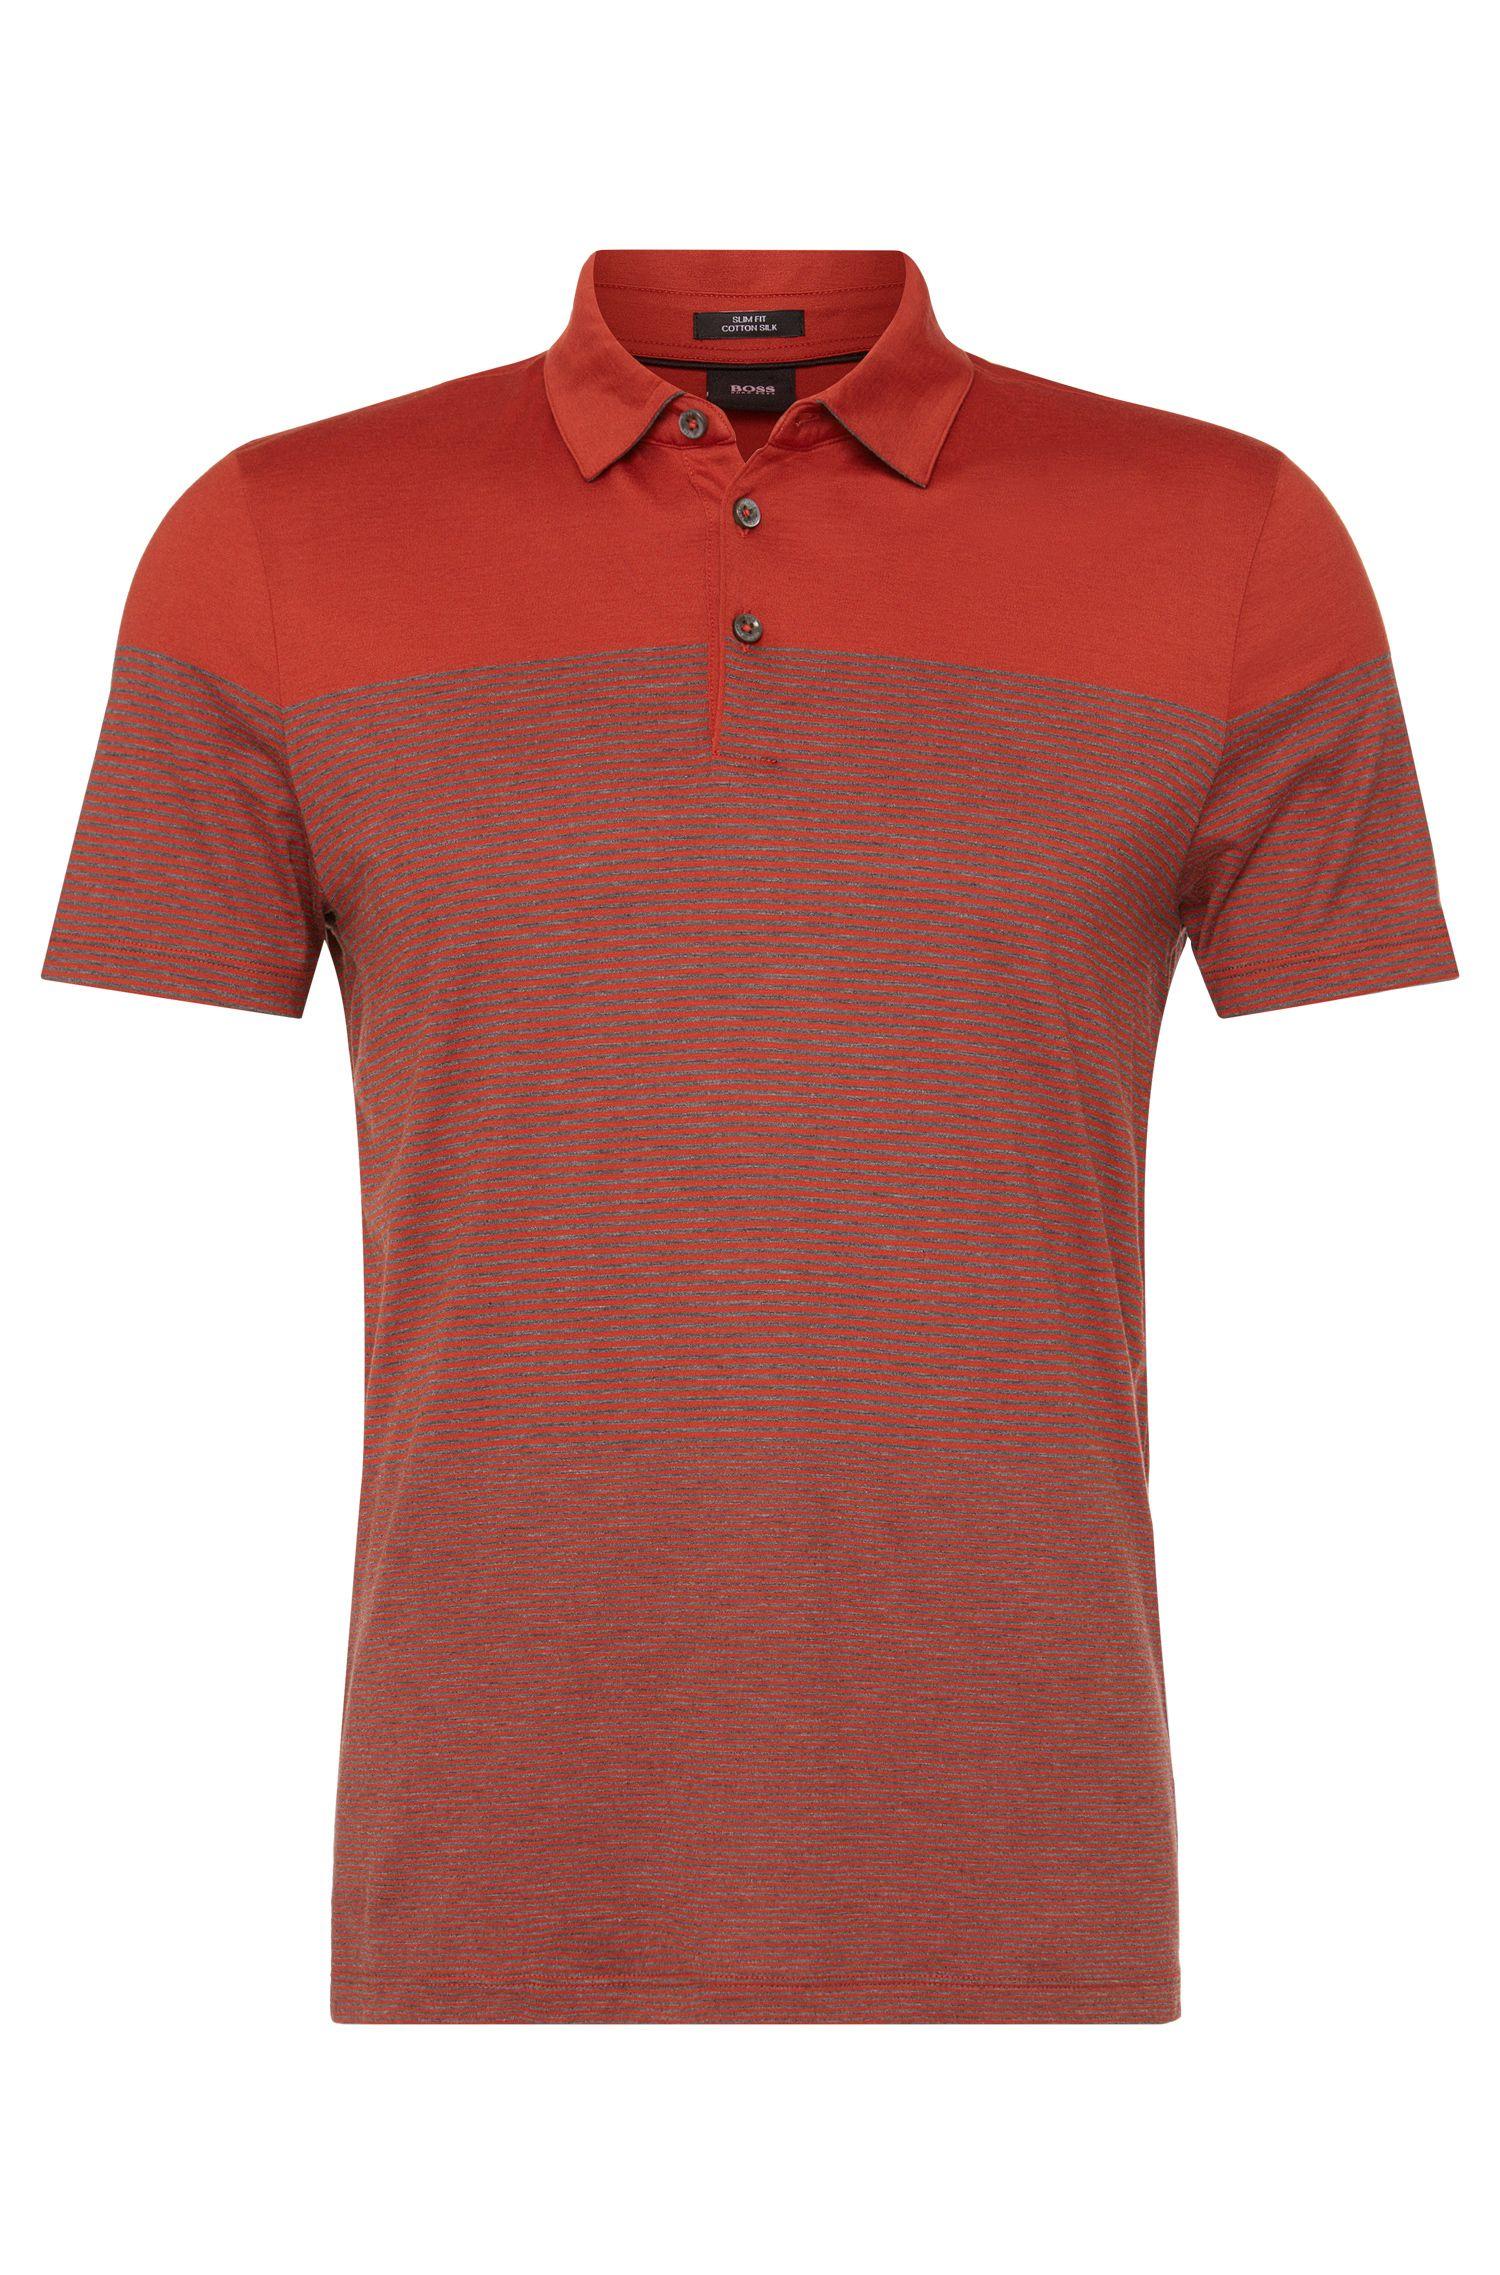 'Place' | Slim Fit, Cotton Silk Striped Polo Shirt